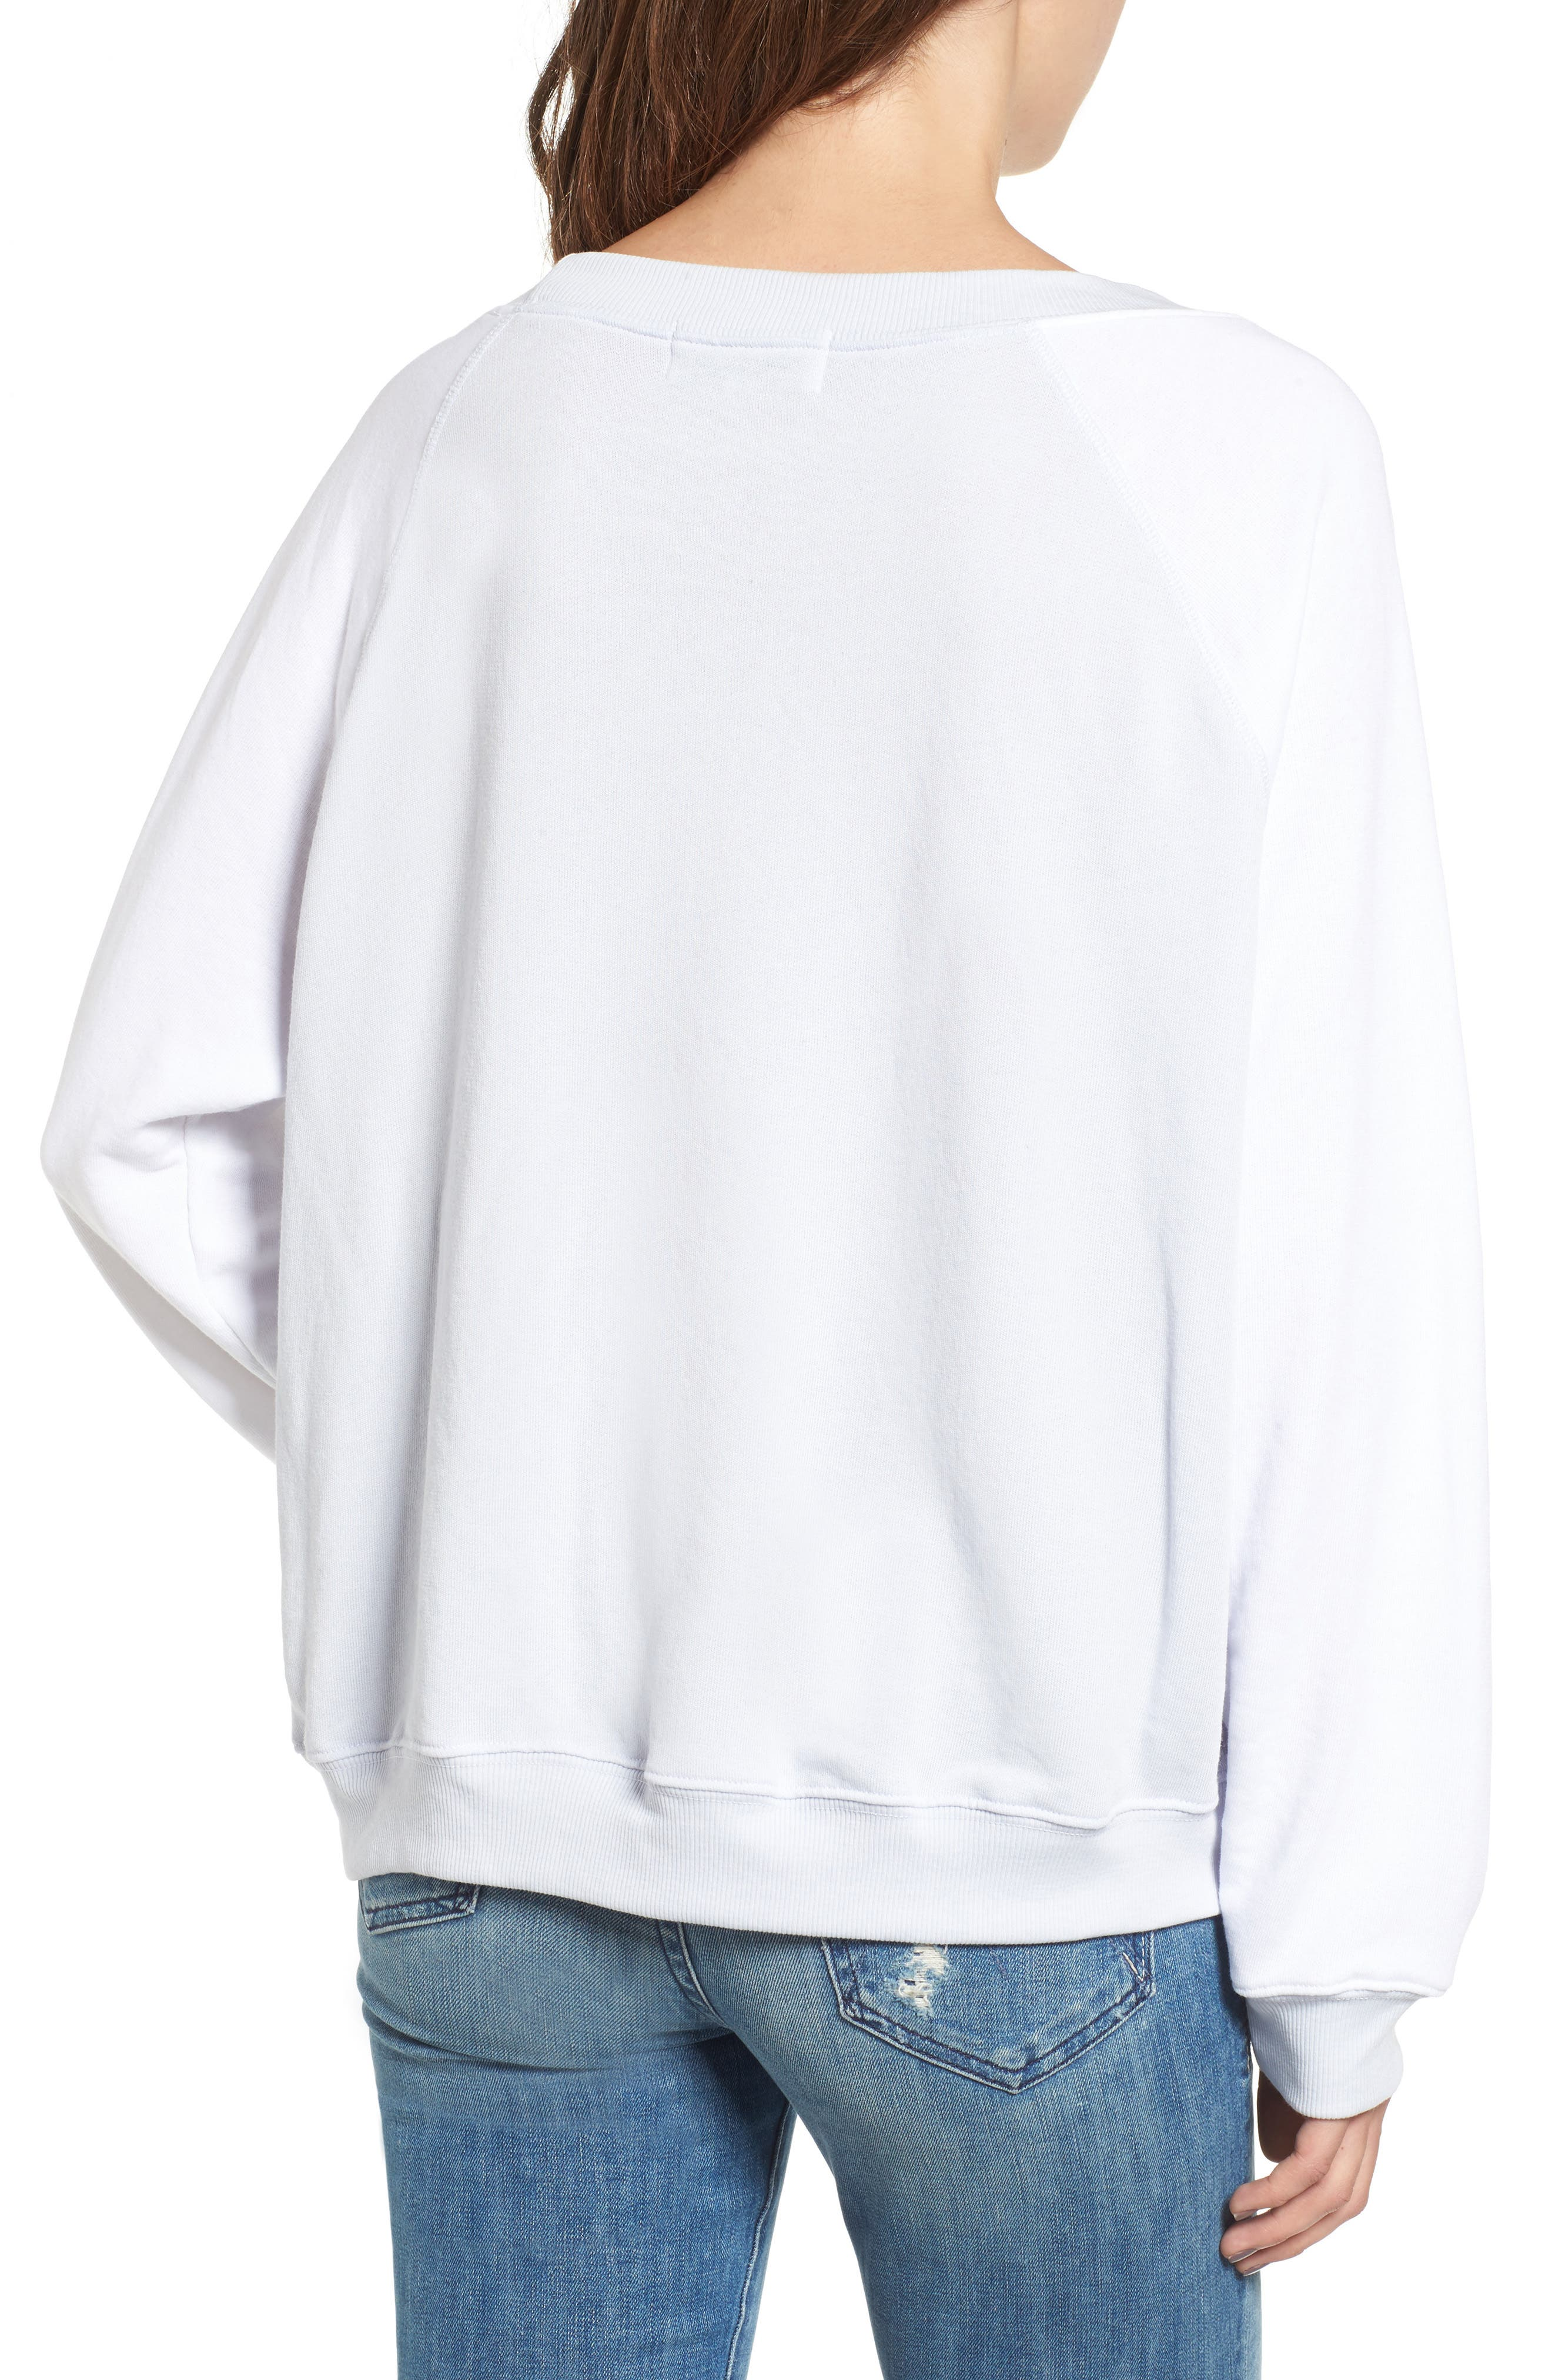 Aspiring Retiree Sweatshirt,                             Alternate thumbnail 2, color,